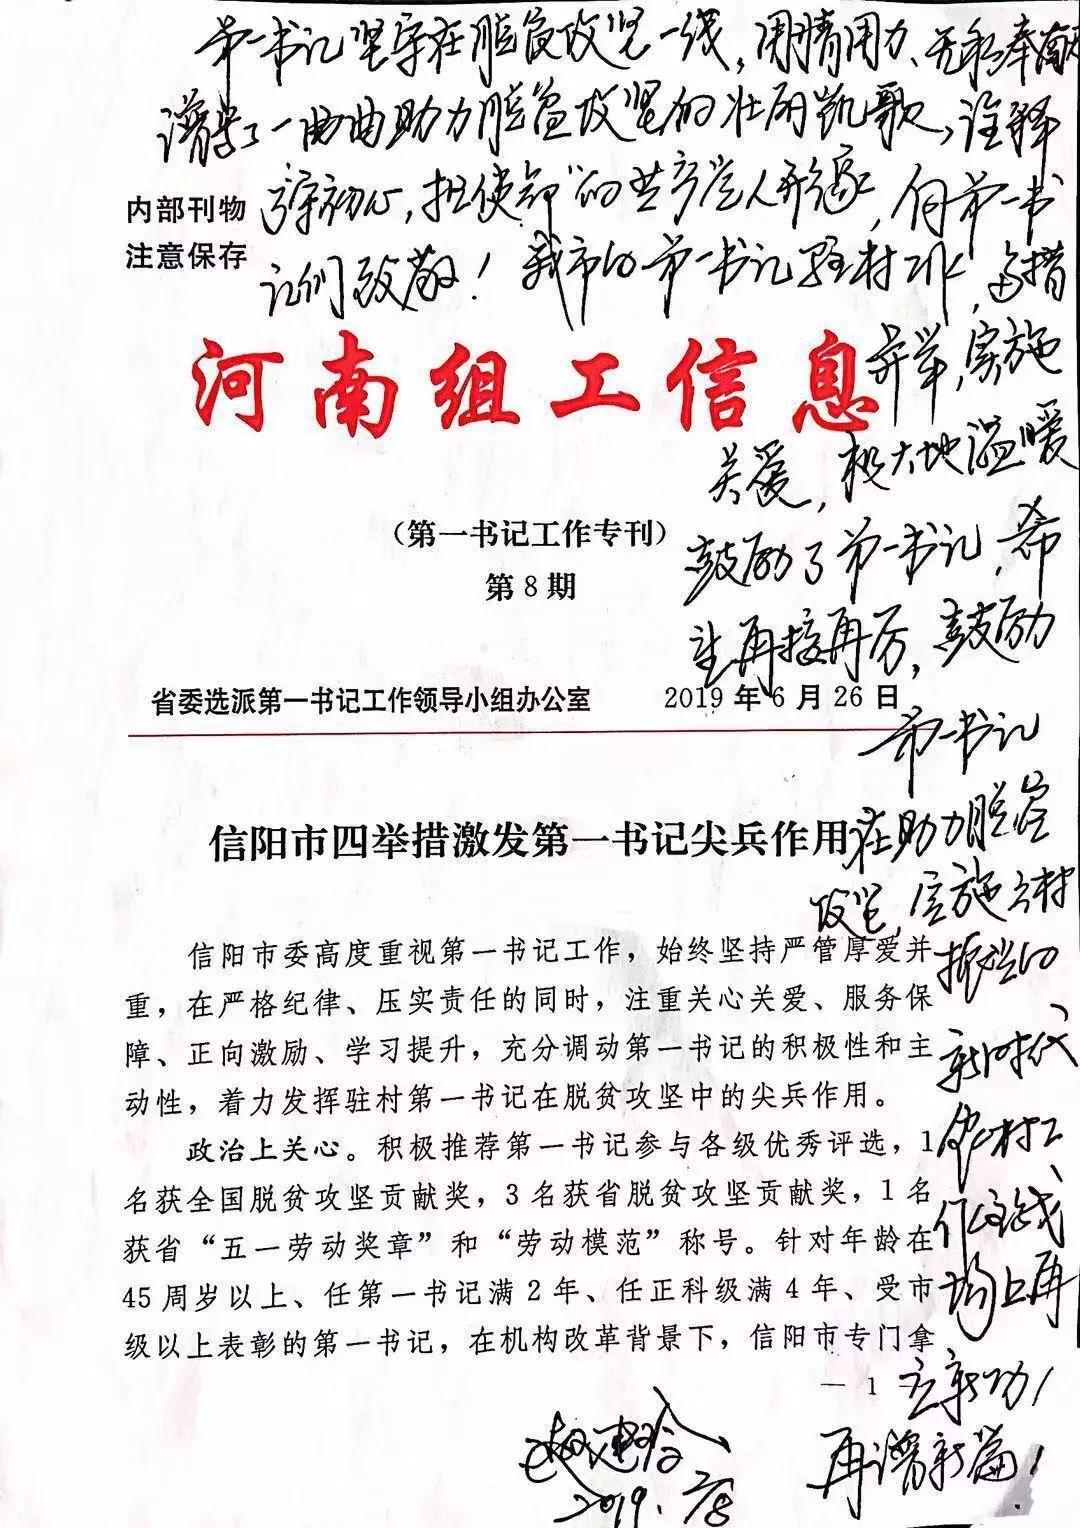 <b>【党建要闻】赵建玲对《河南组工信息》编发《信阳市四举措激发第一书记尖兵作用》信息作出批示</b>